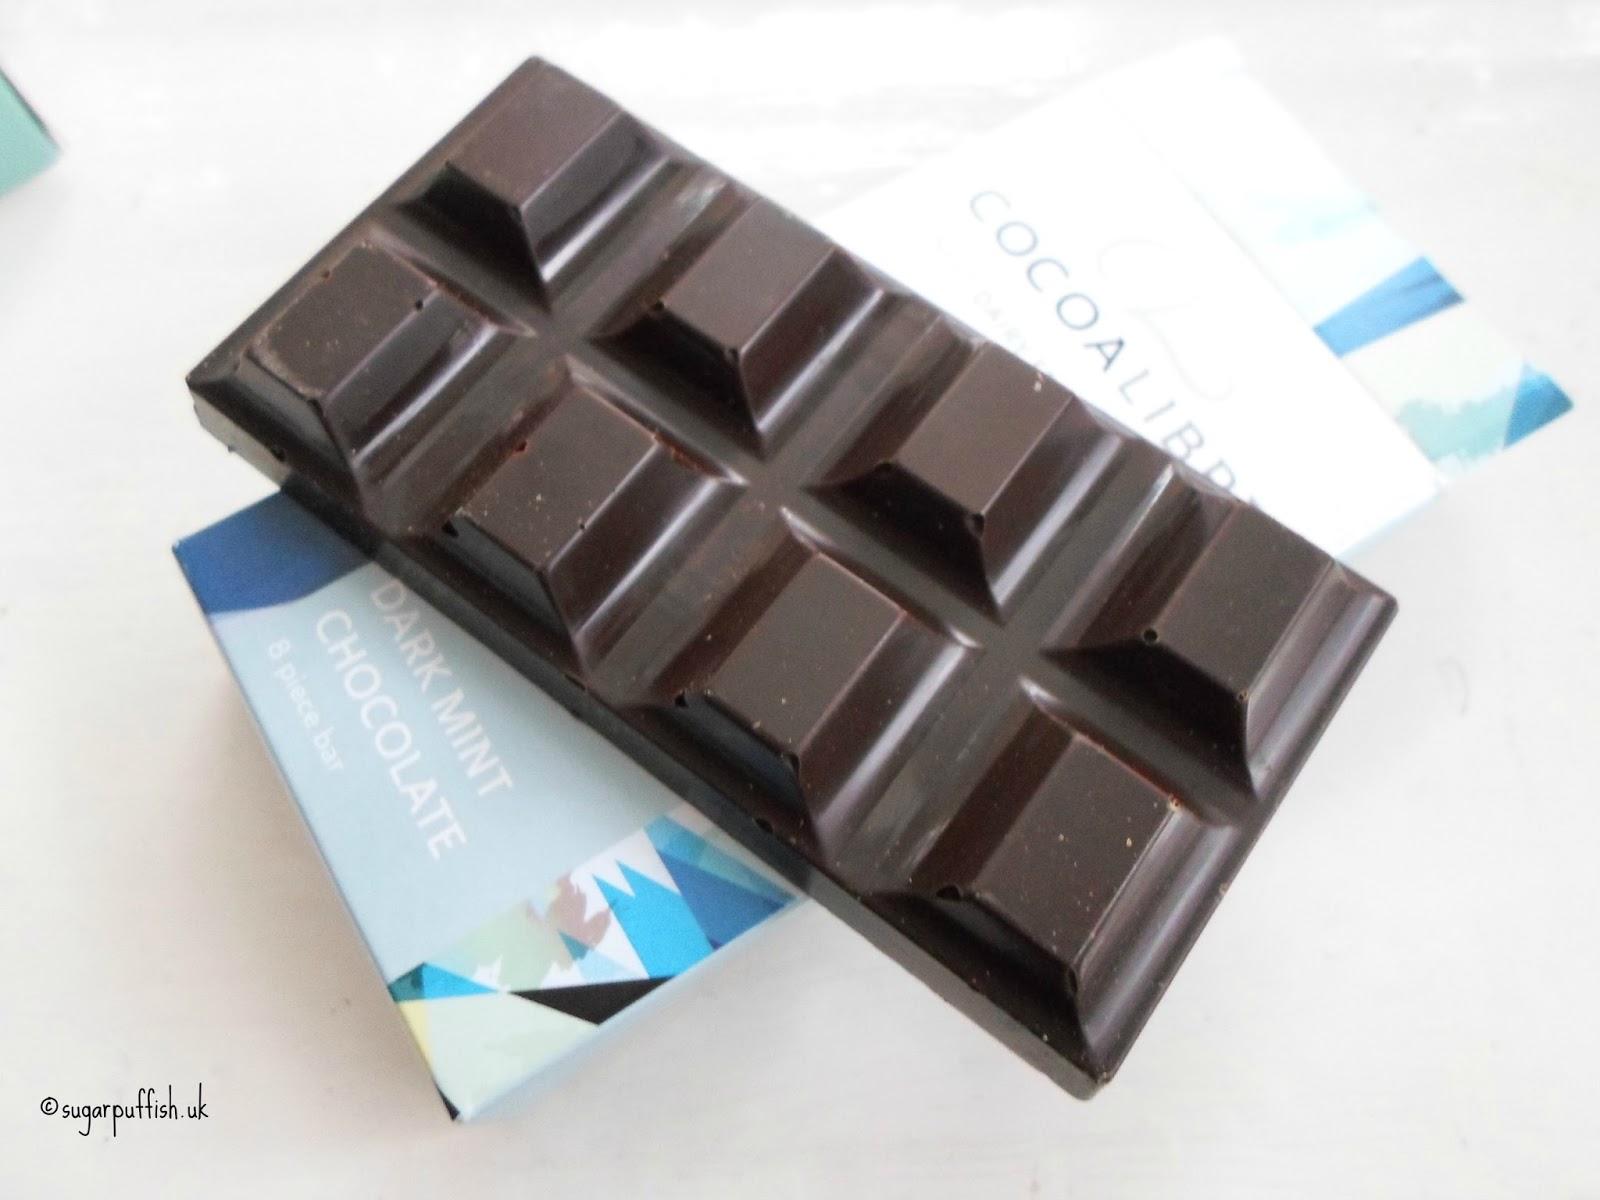 cocoa libre dark mint bar dairy free